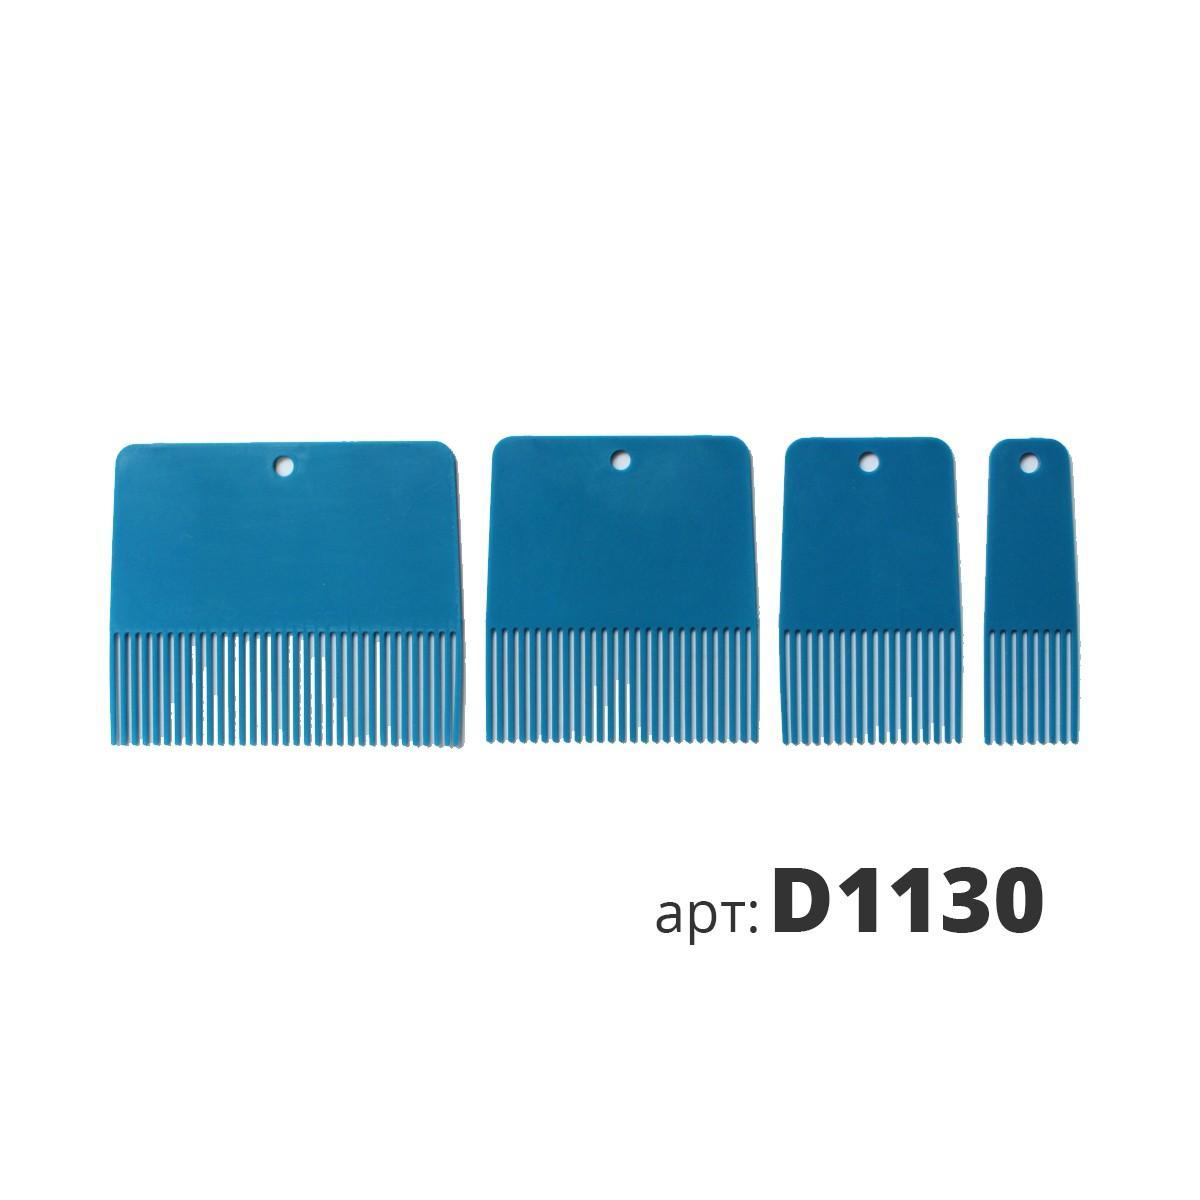 Скребок-гребенка (набор из 4-х штук) D1130